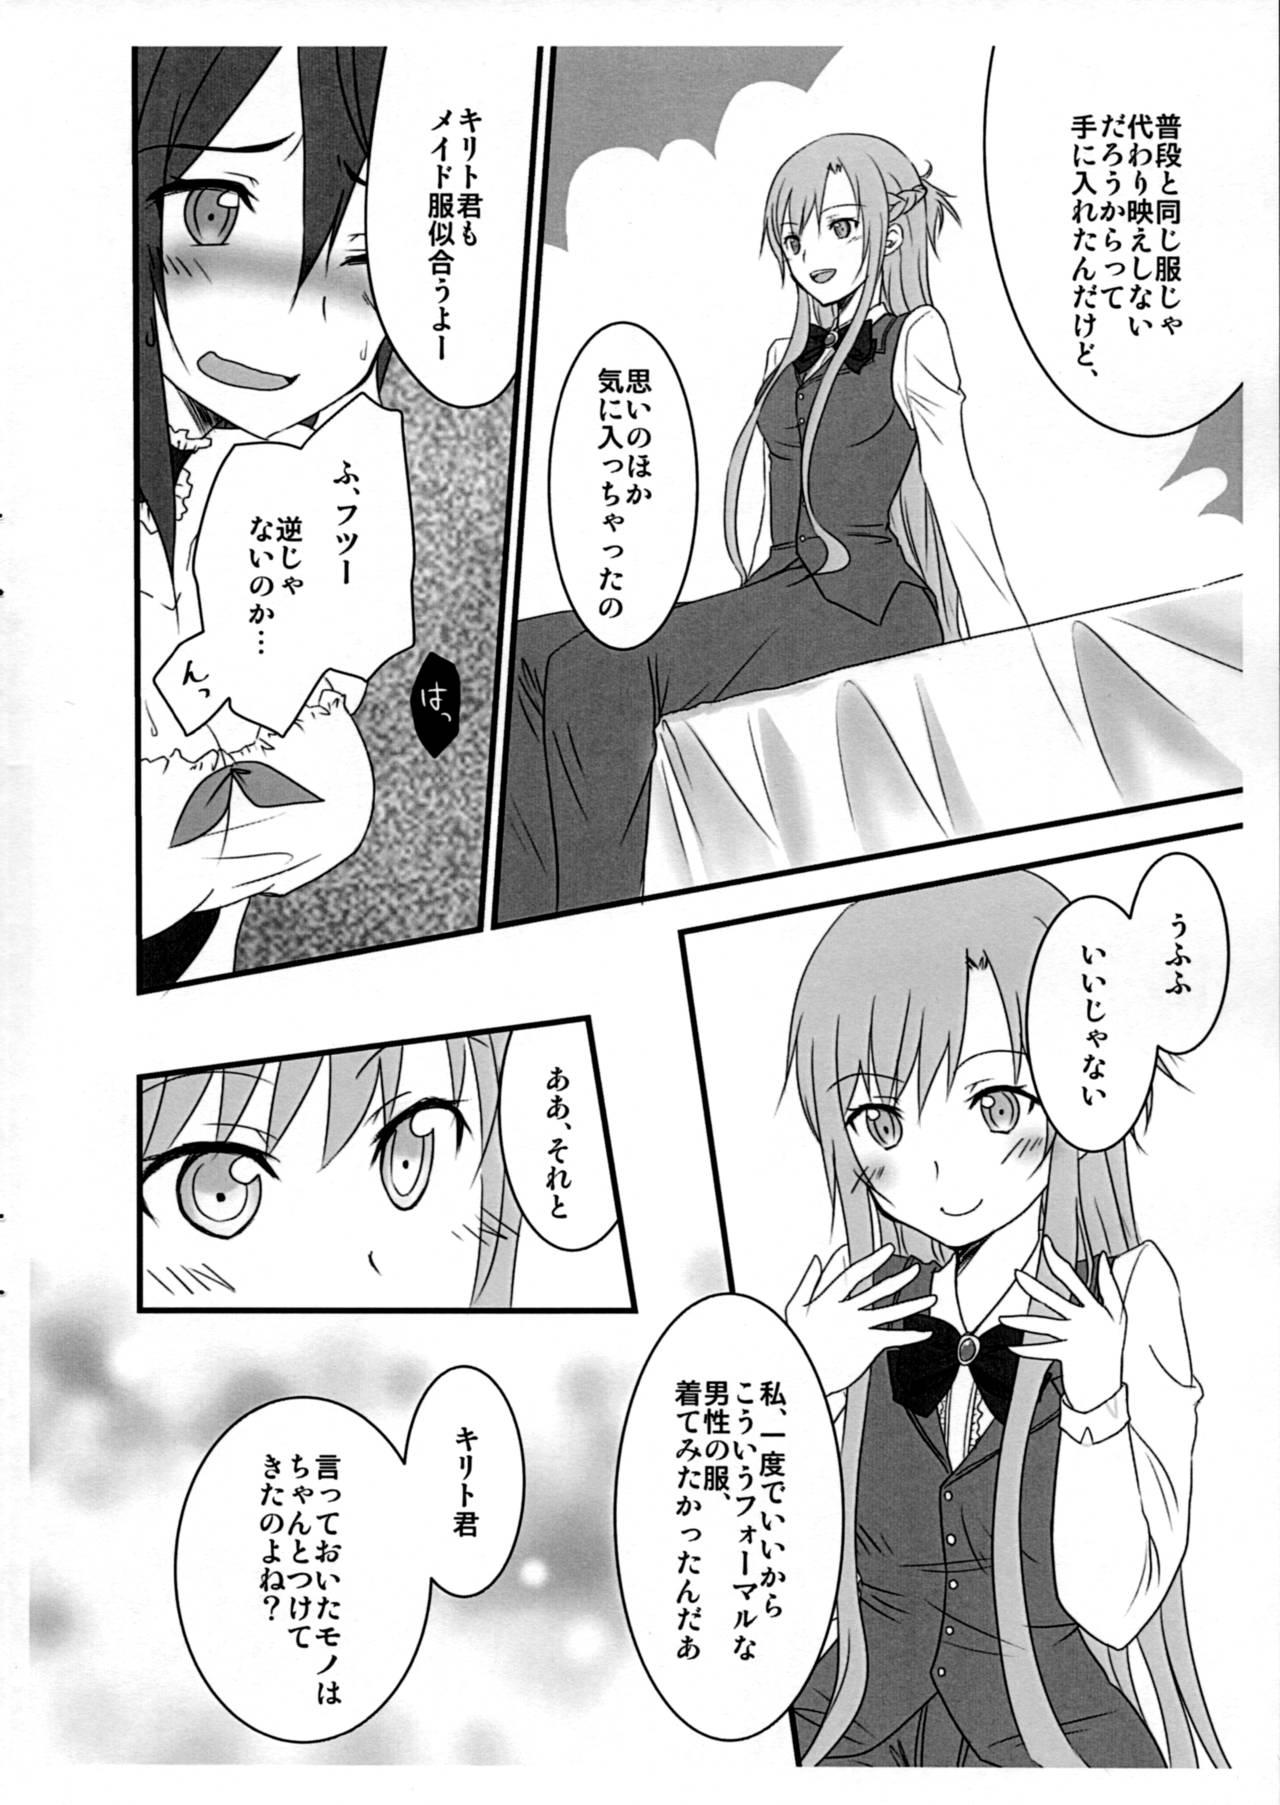 (C89) [AQUA SPACE (Asuka)] Kiriko-chan to Asobou! ~Maid-hen~ (Sword Art Online) 4